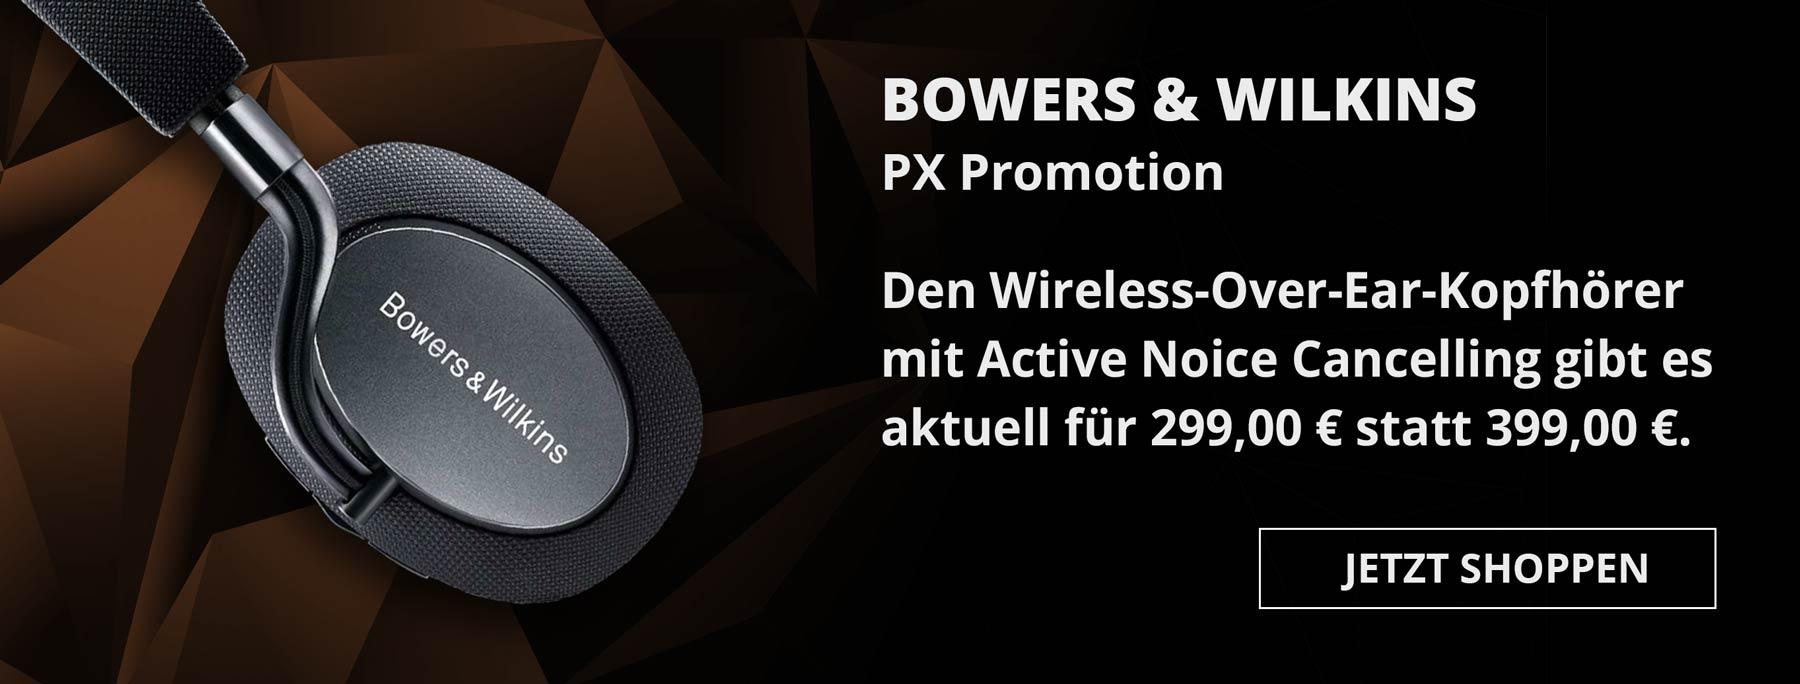 Aktion: Bowers & Wilkins PX (Angebot)